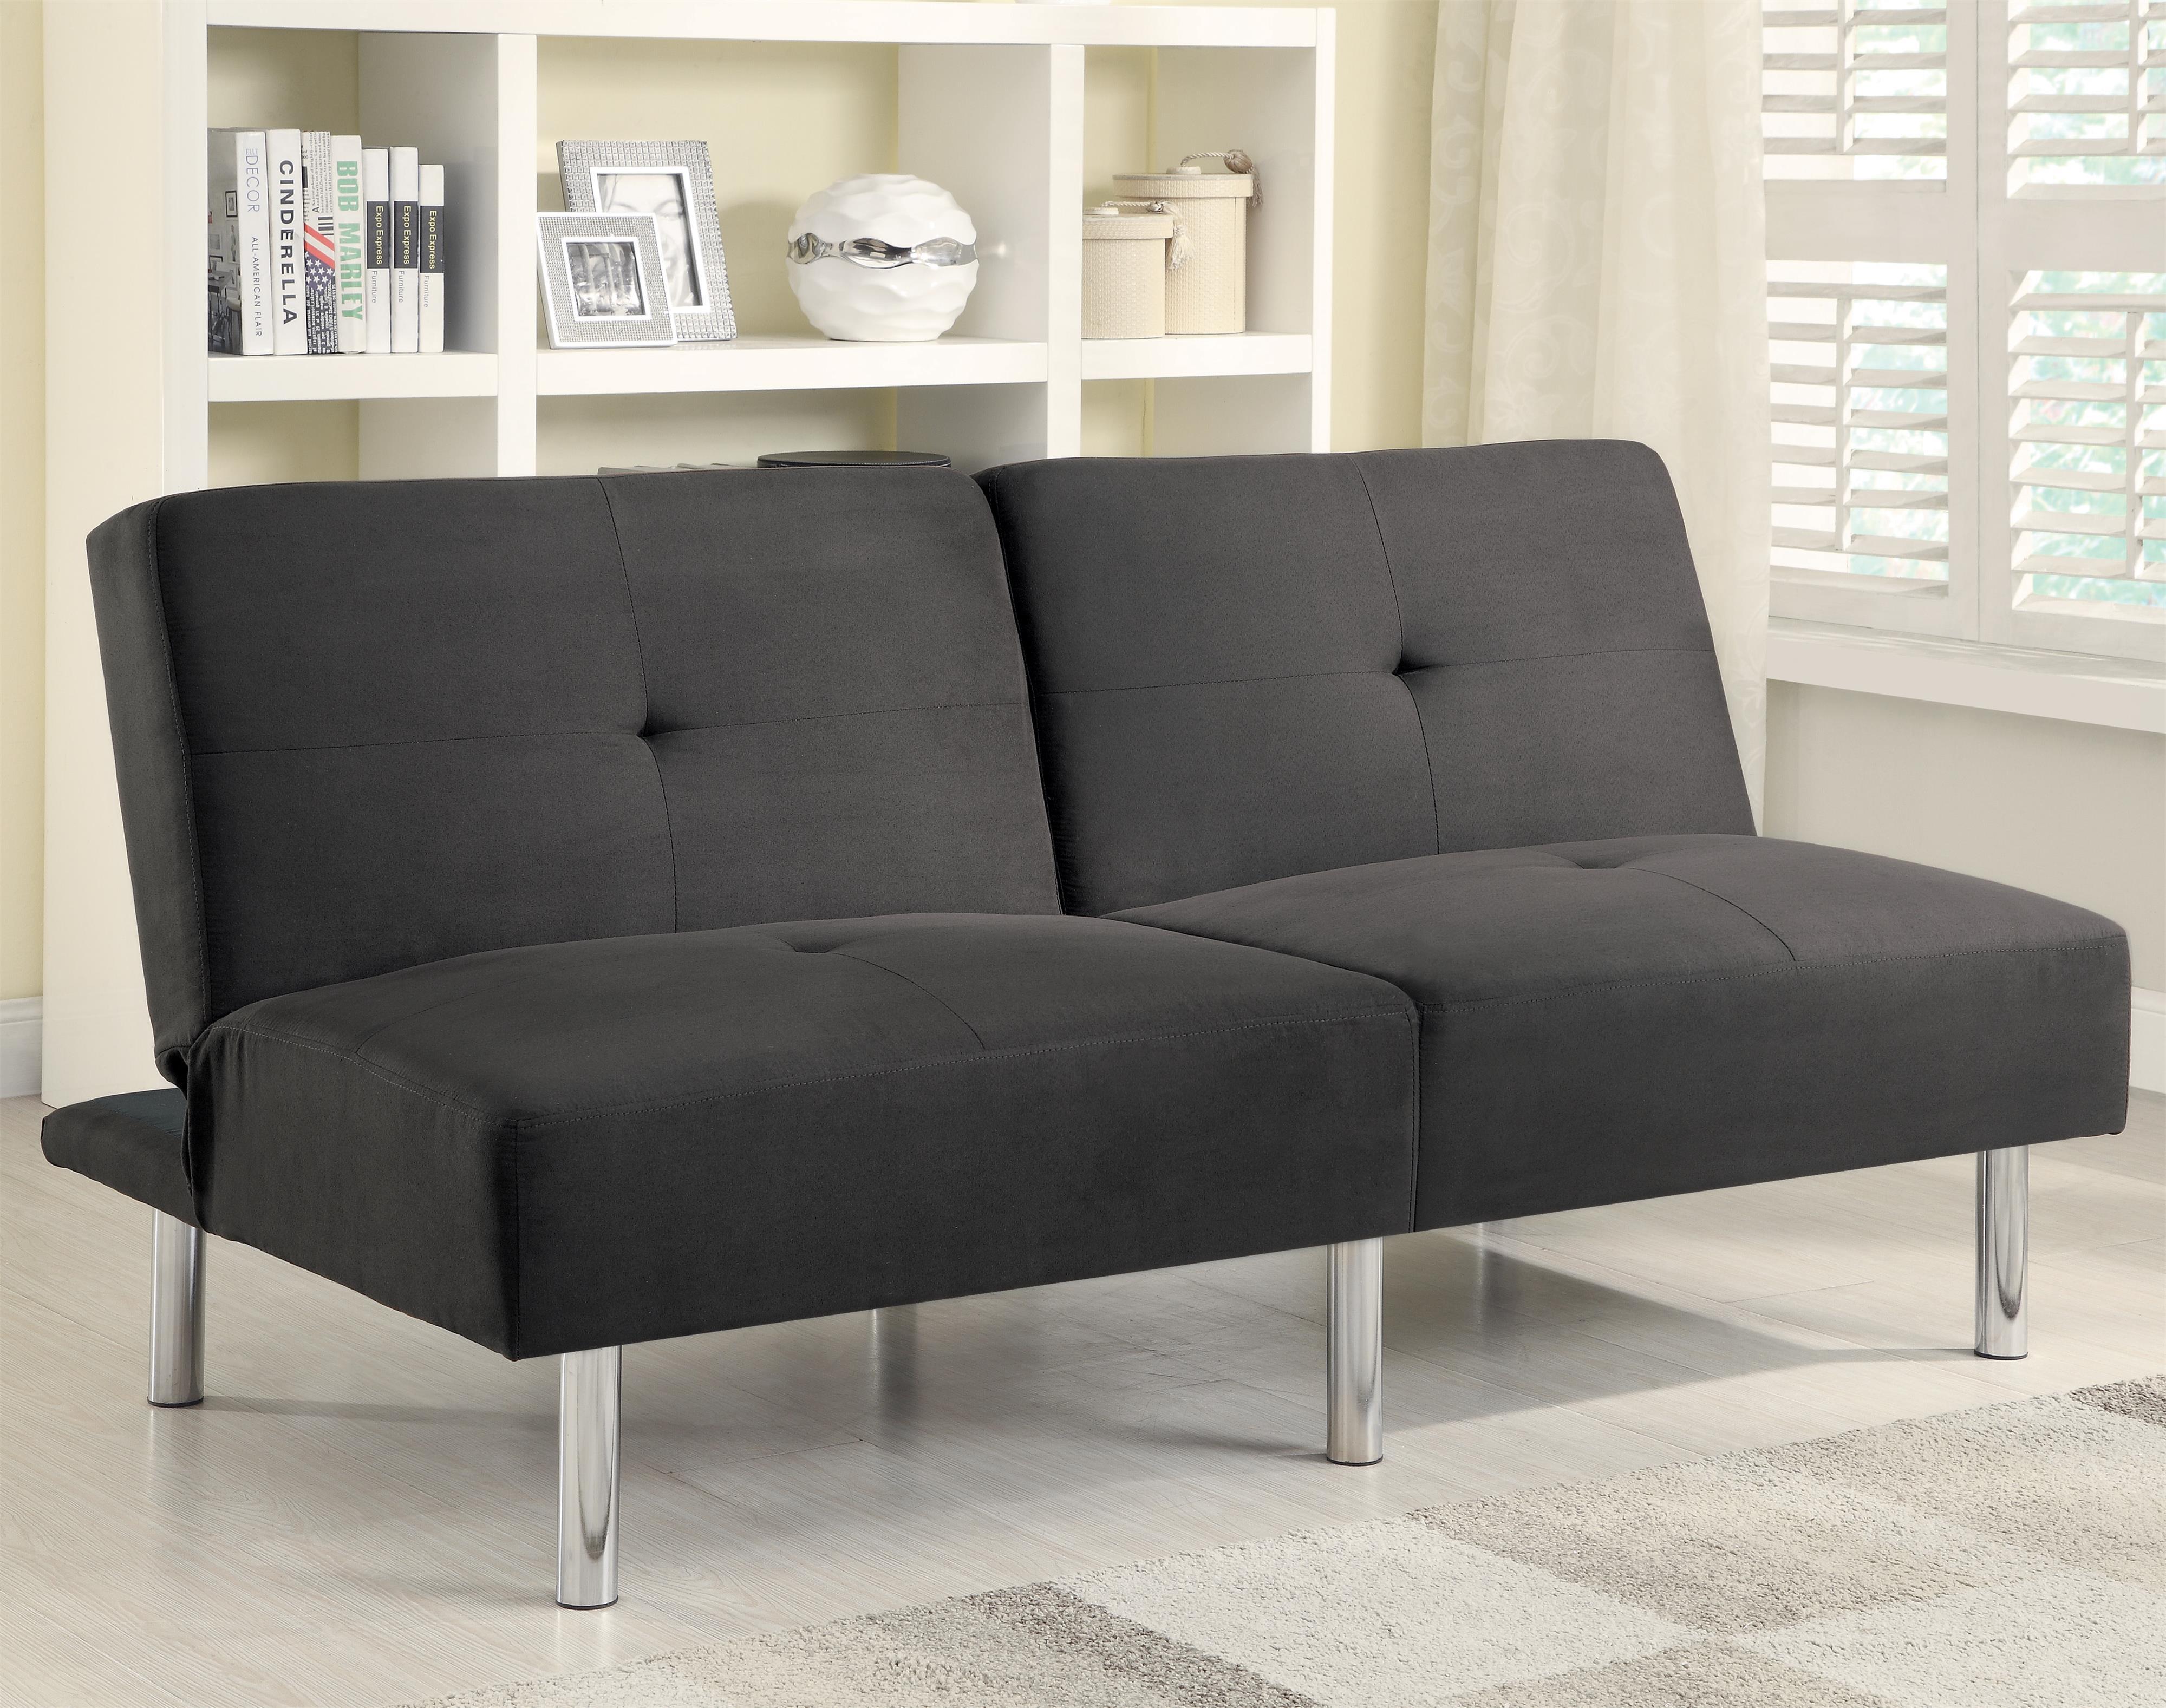 Sofa Beds and Futons  Contemporary Microfiber Sofa Bed